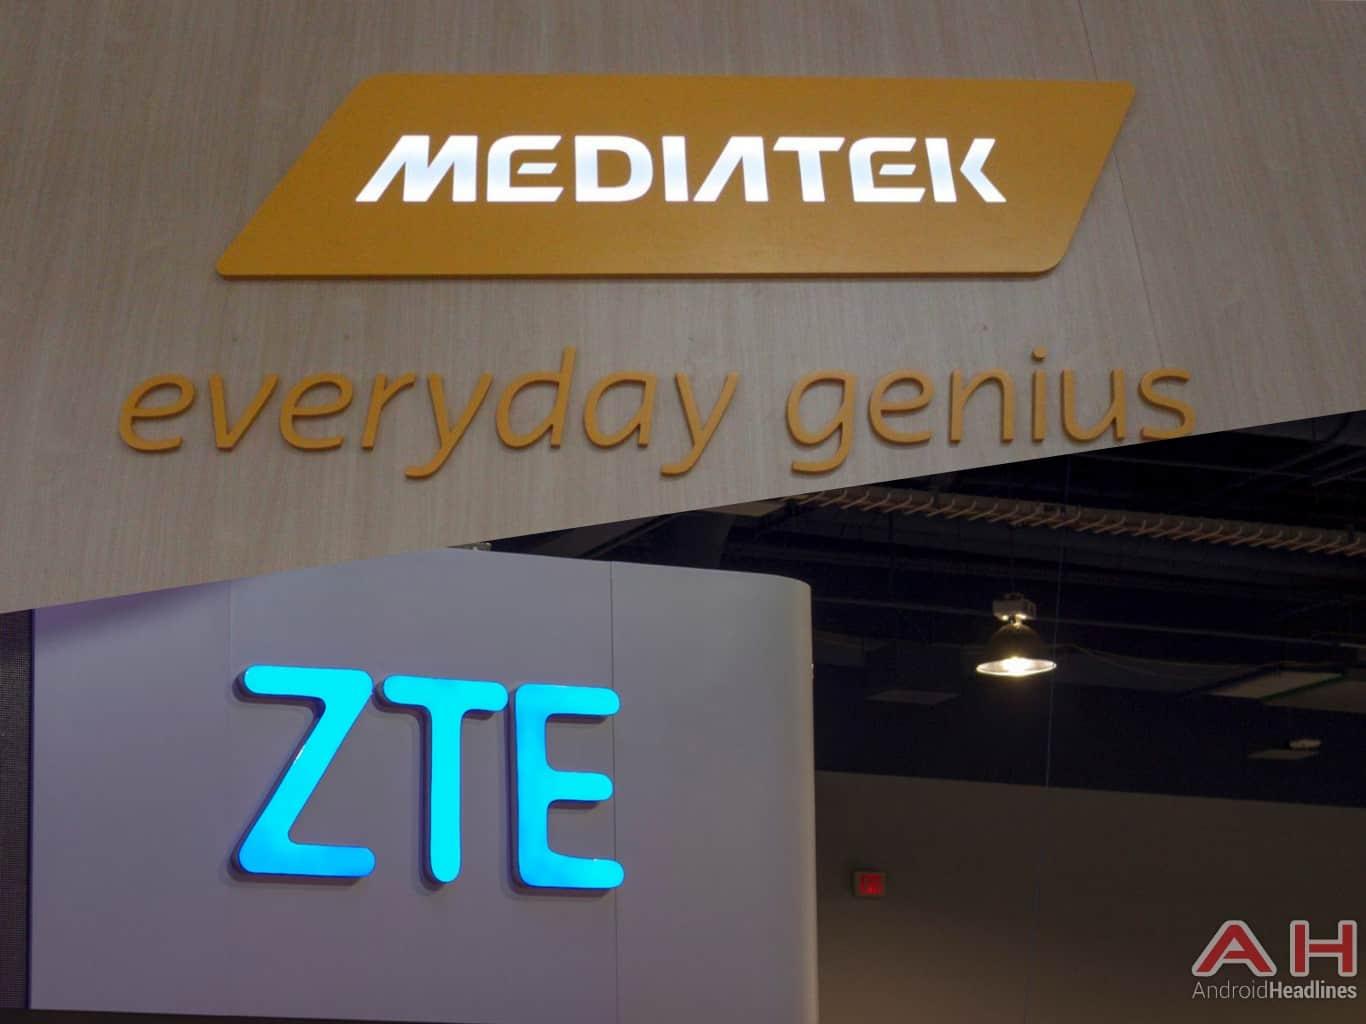 Mediatek Zte Announce Certification Of The Nb Iot R14 Mwc 2018